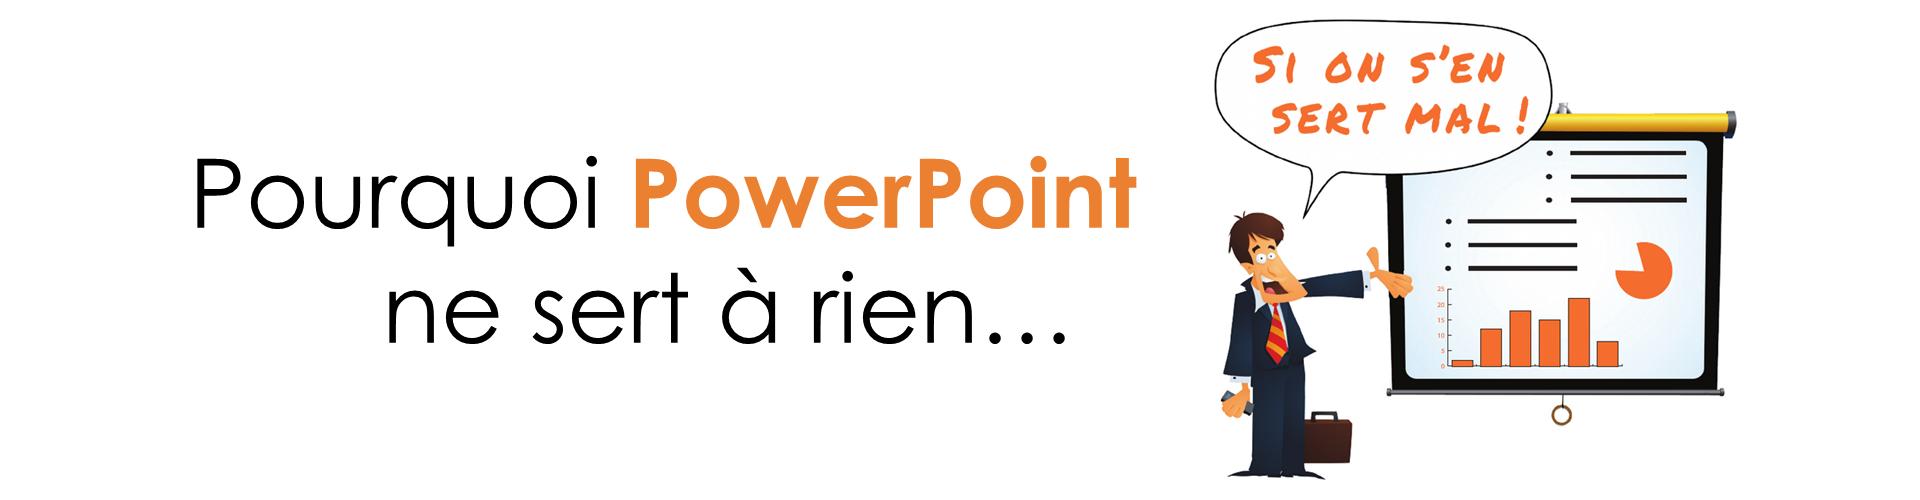 Pourquoi PowerPoint ne sert à rien si on s'en sert mal